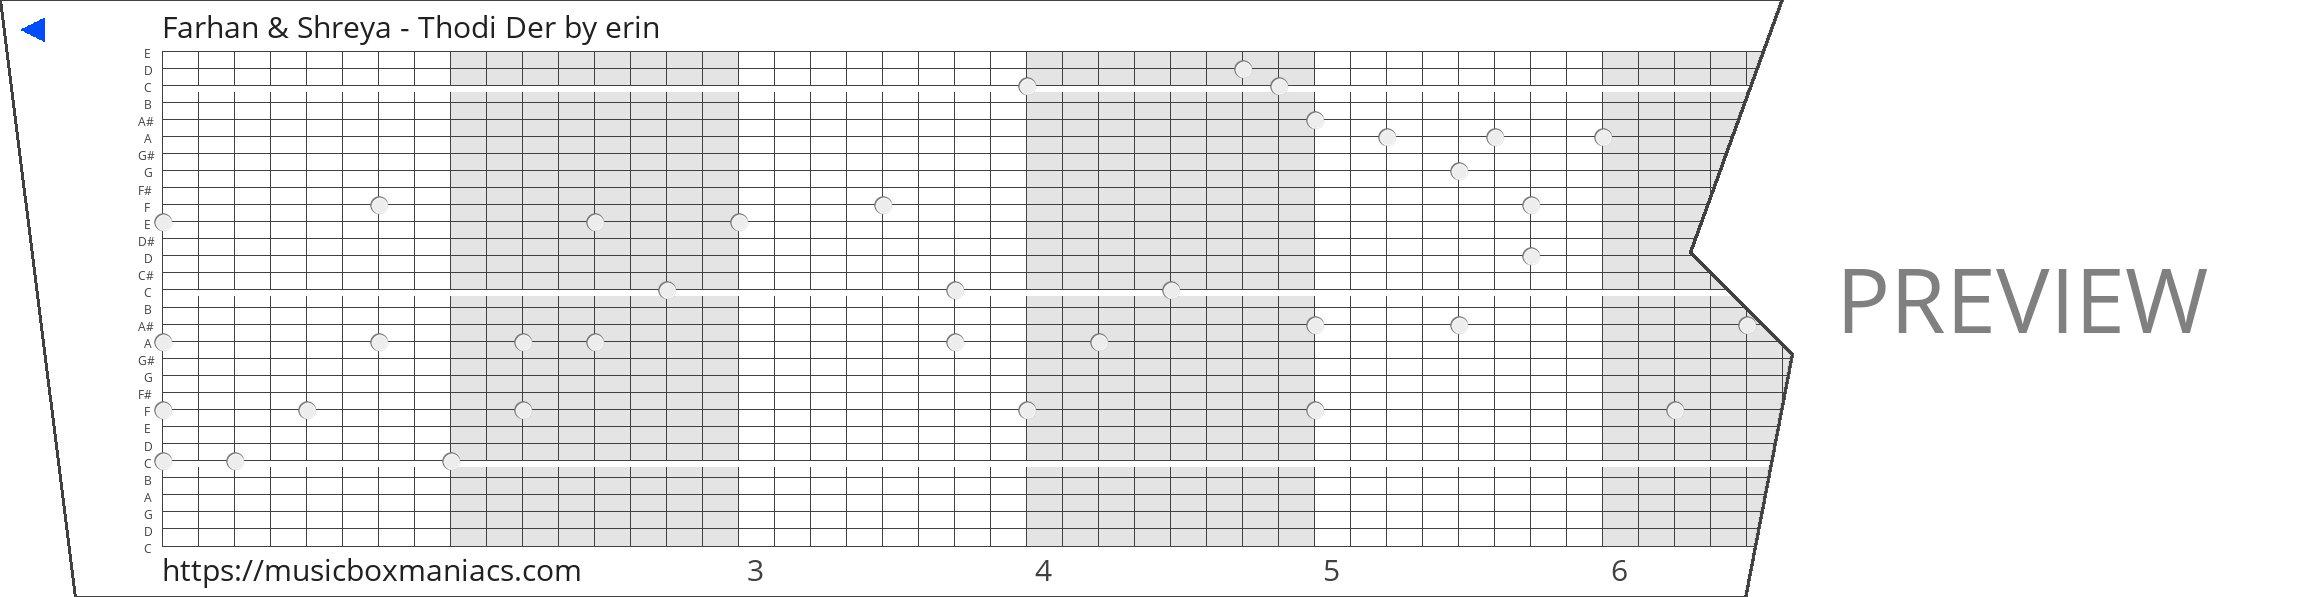 Farhan & Shreya - Thodi Der 30 note music box paper strip